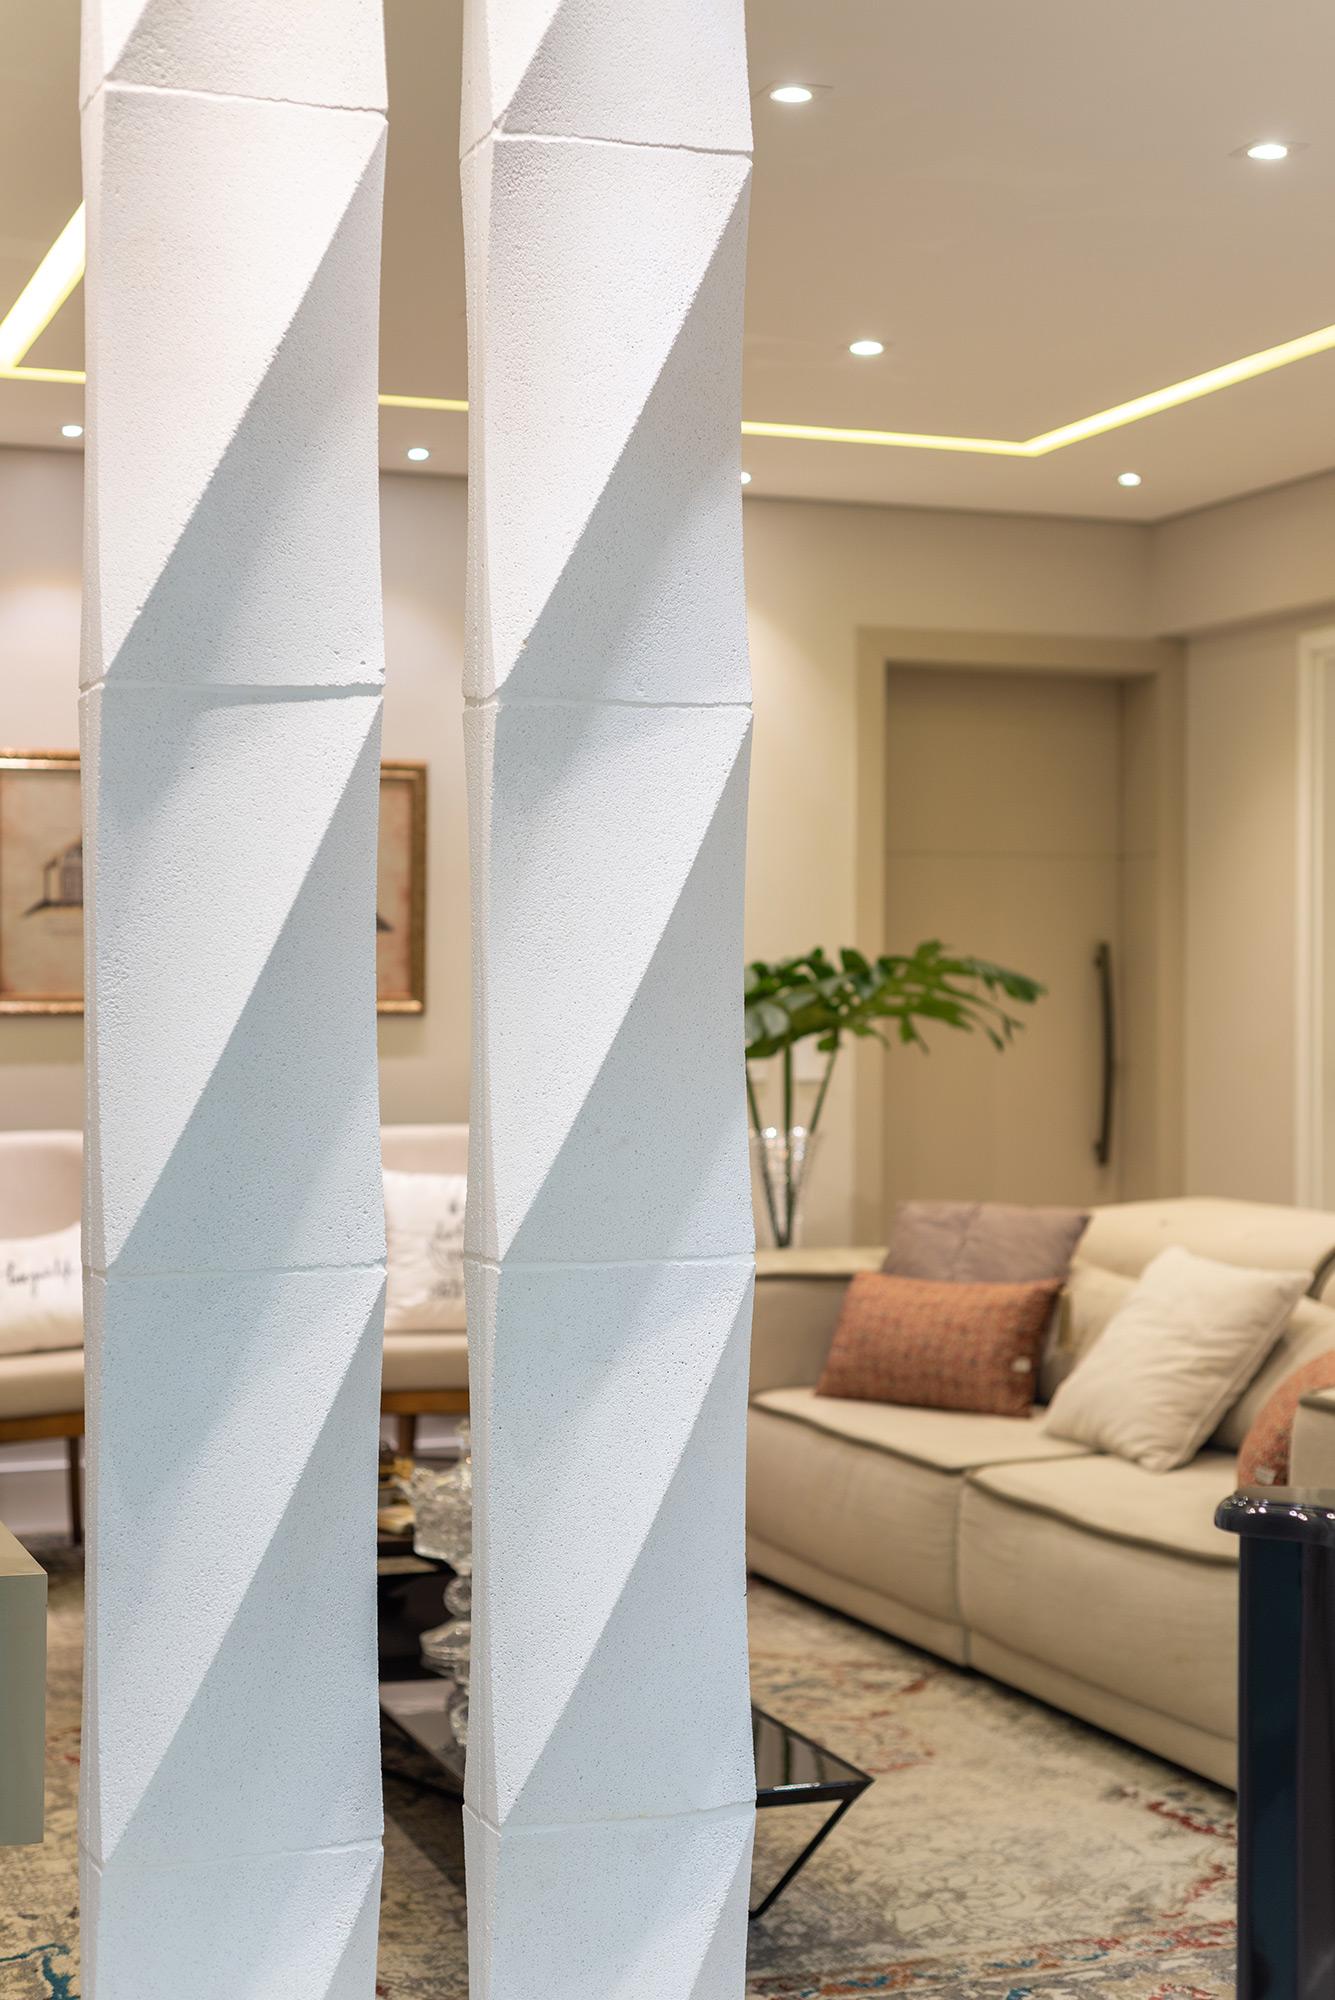 Colonna Grezzo Branco no projeto da arquiteta Heloisa Pascote. A foto é de Favaro Jr.